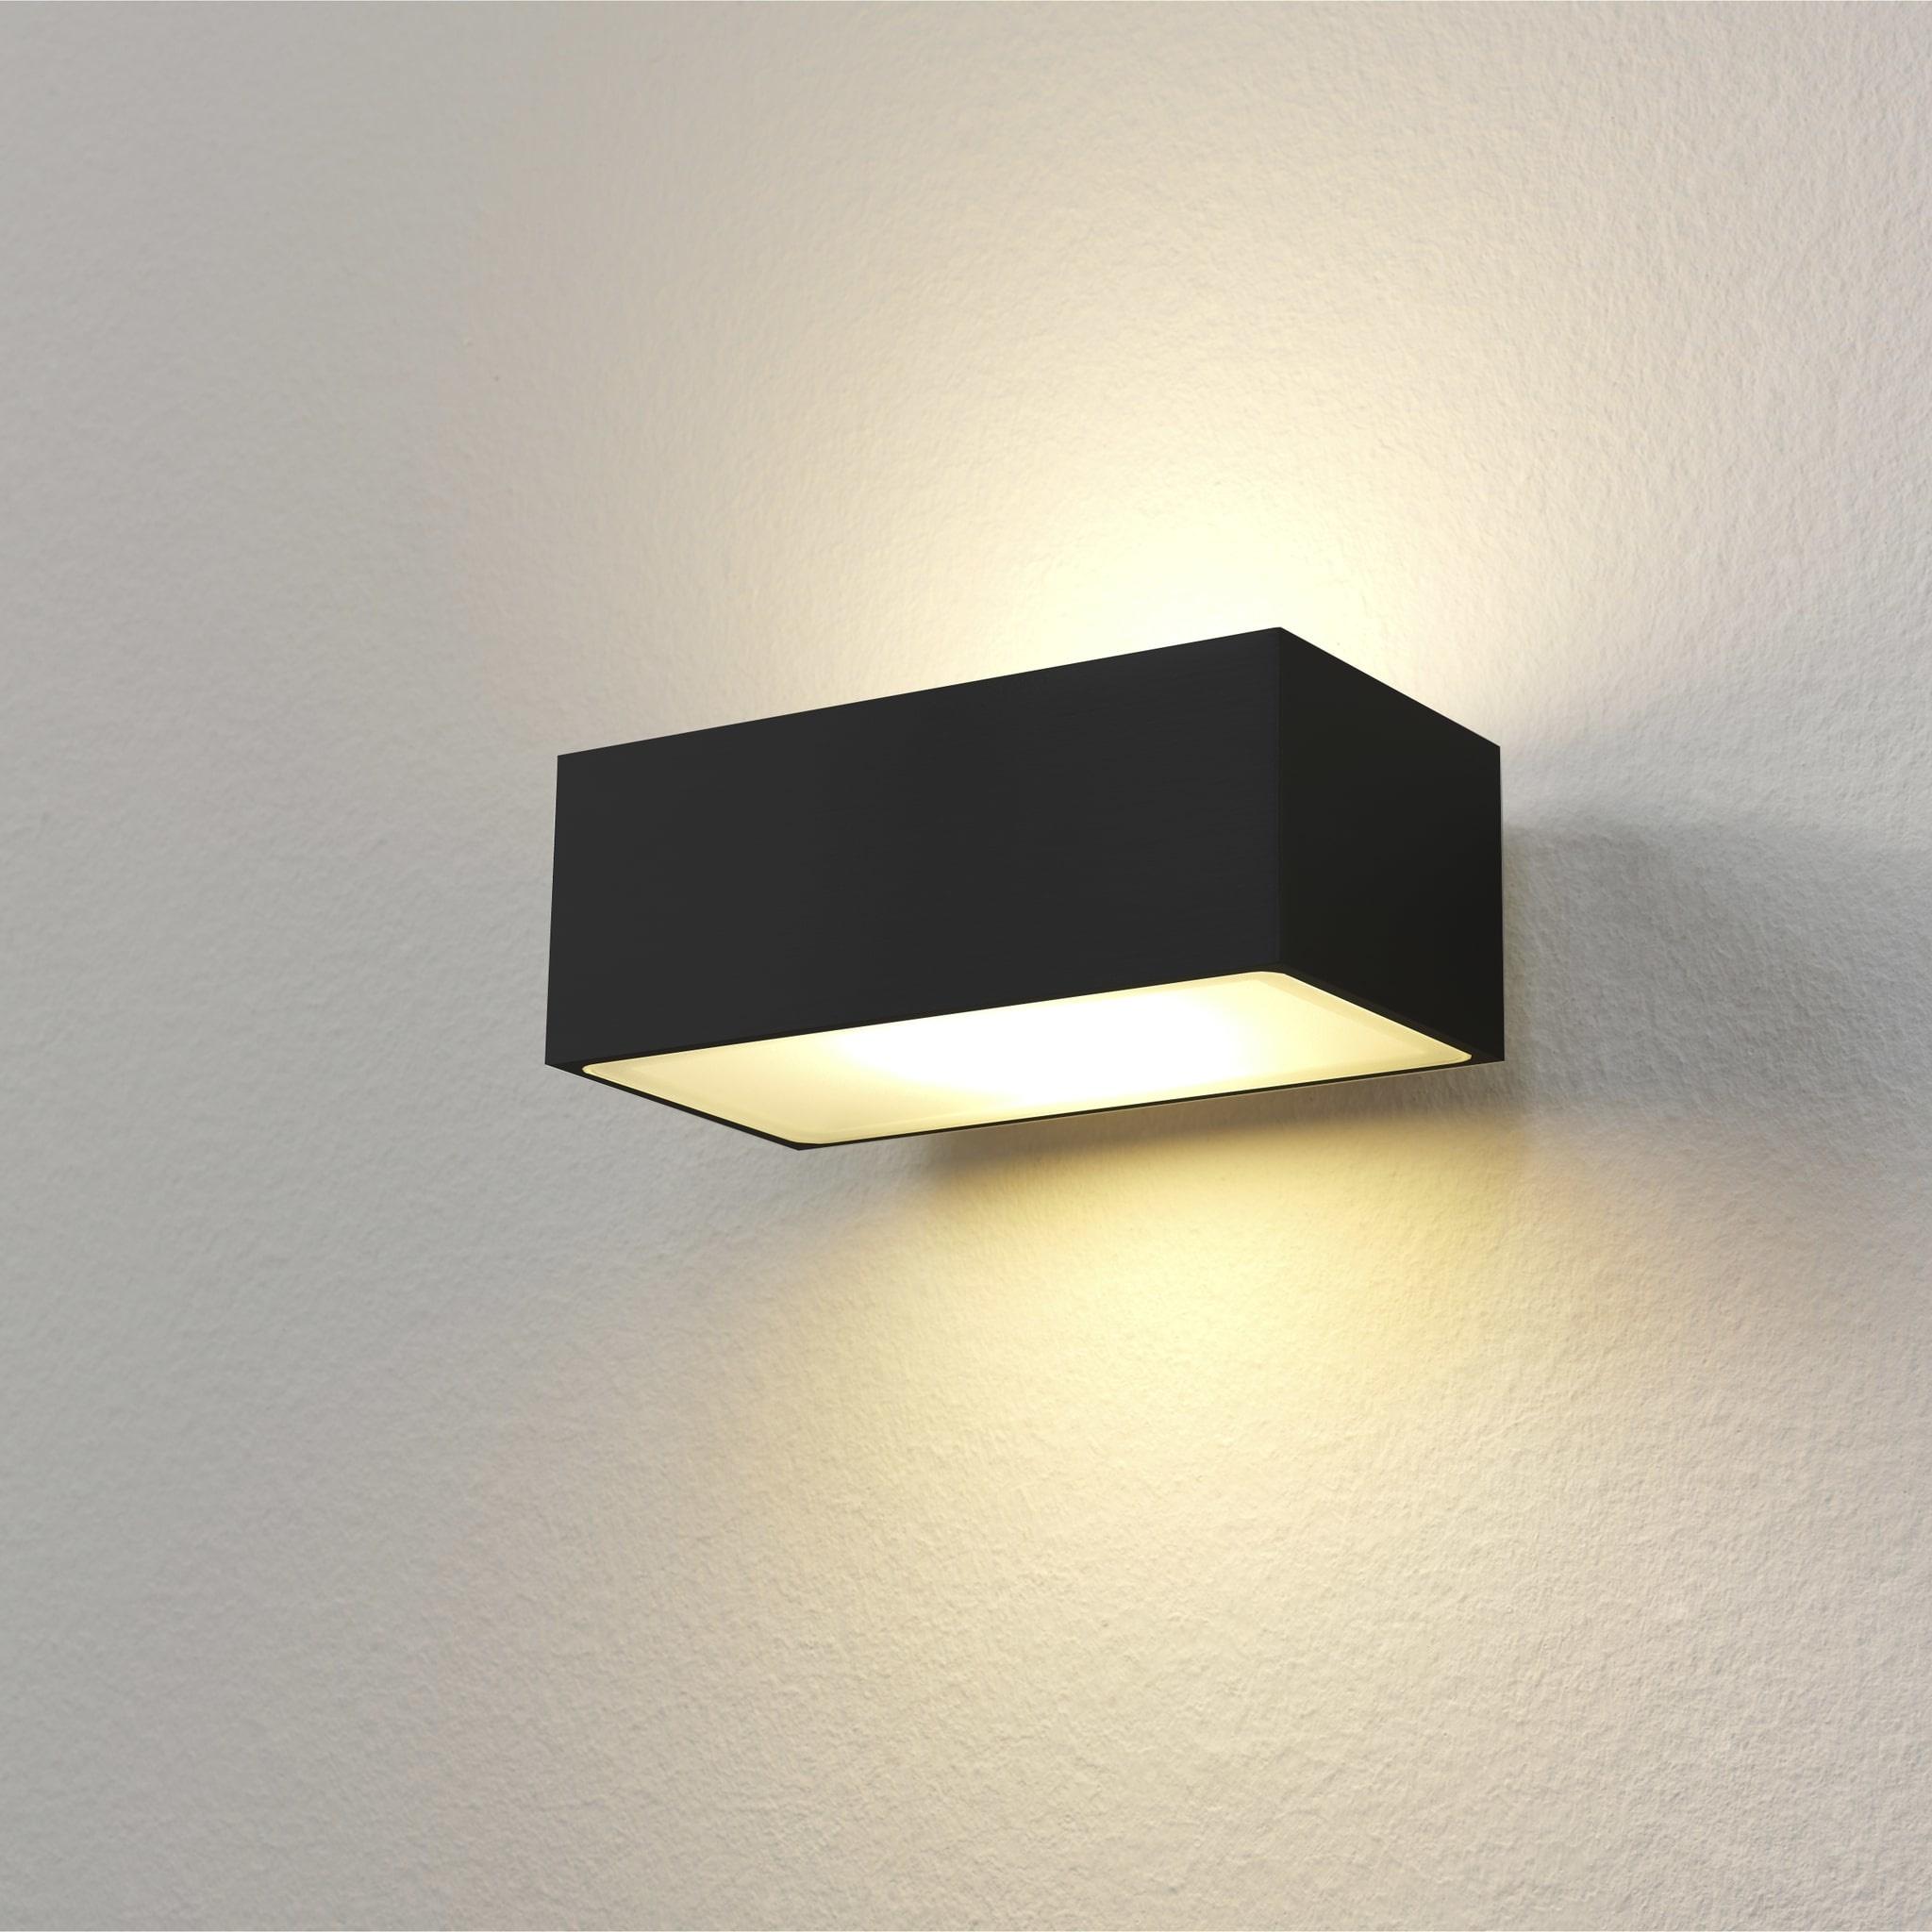 Artdelight Wandlamp Eindhoven L 13 cm zwart